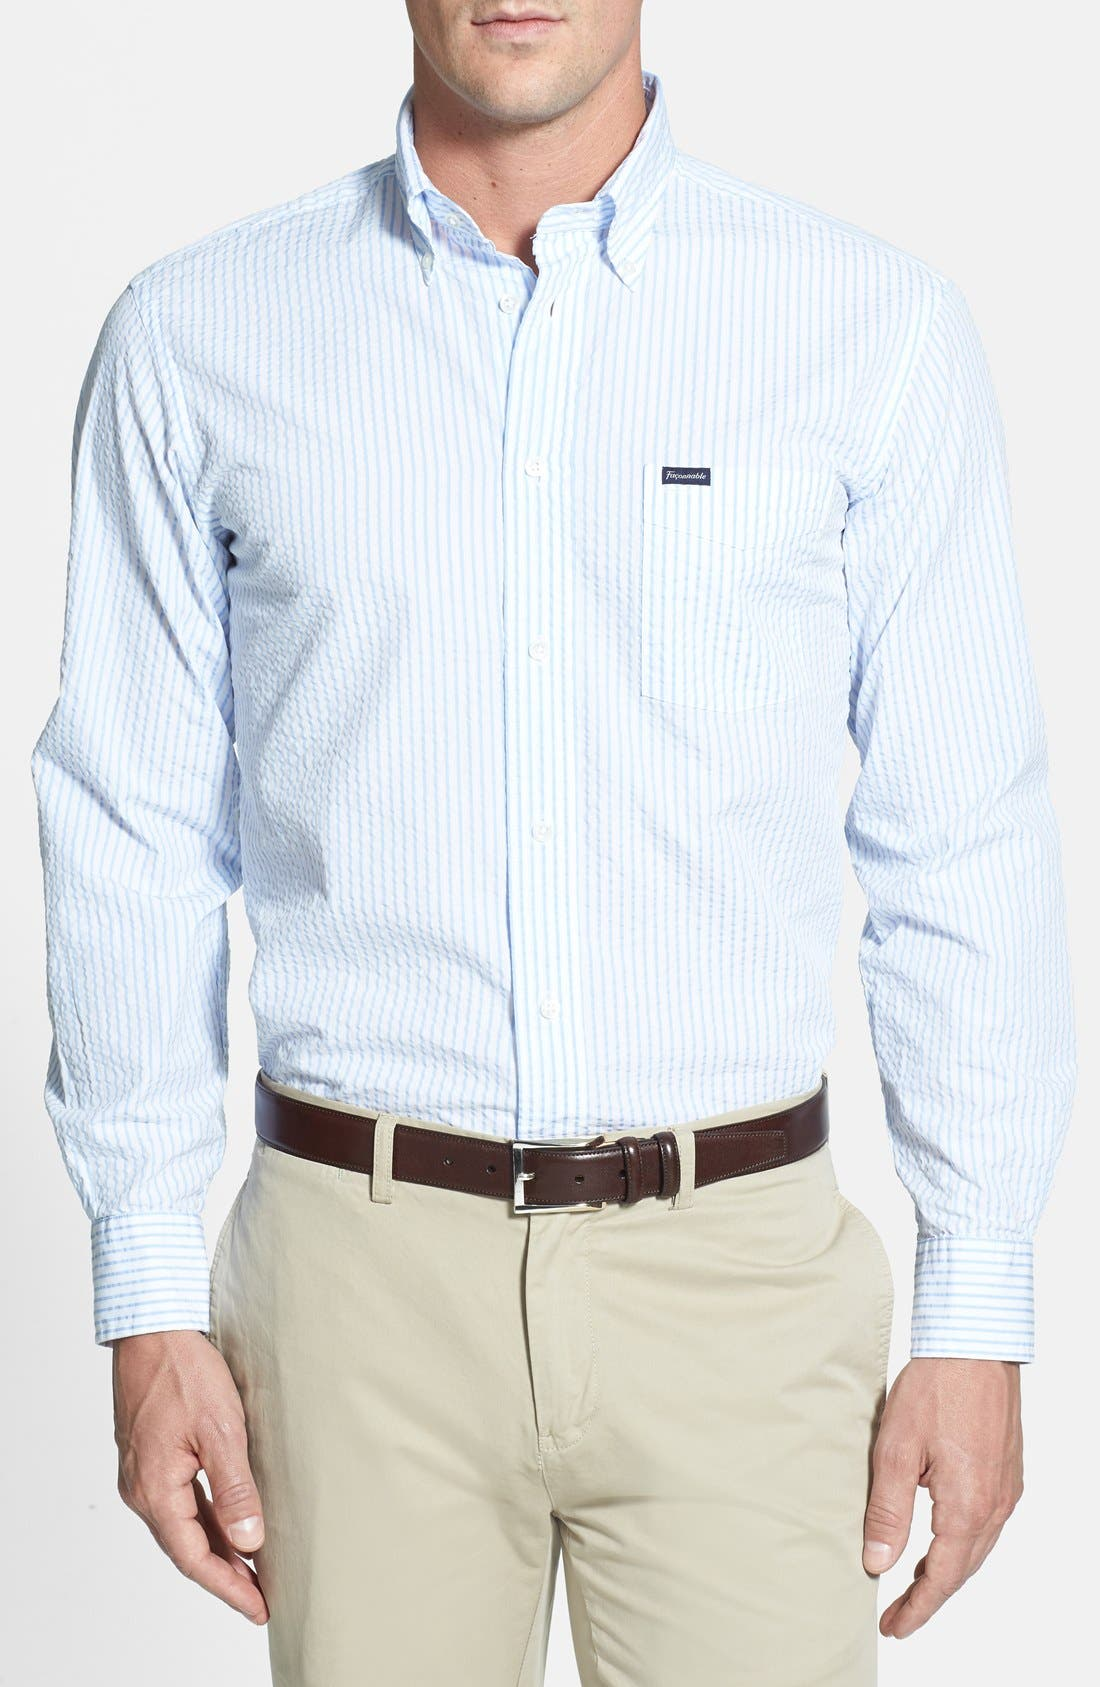 Alternate Image 1 Selected - Façonnable Classique Fit Seersucker Sport Shirt (Tall)